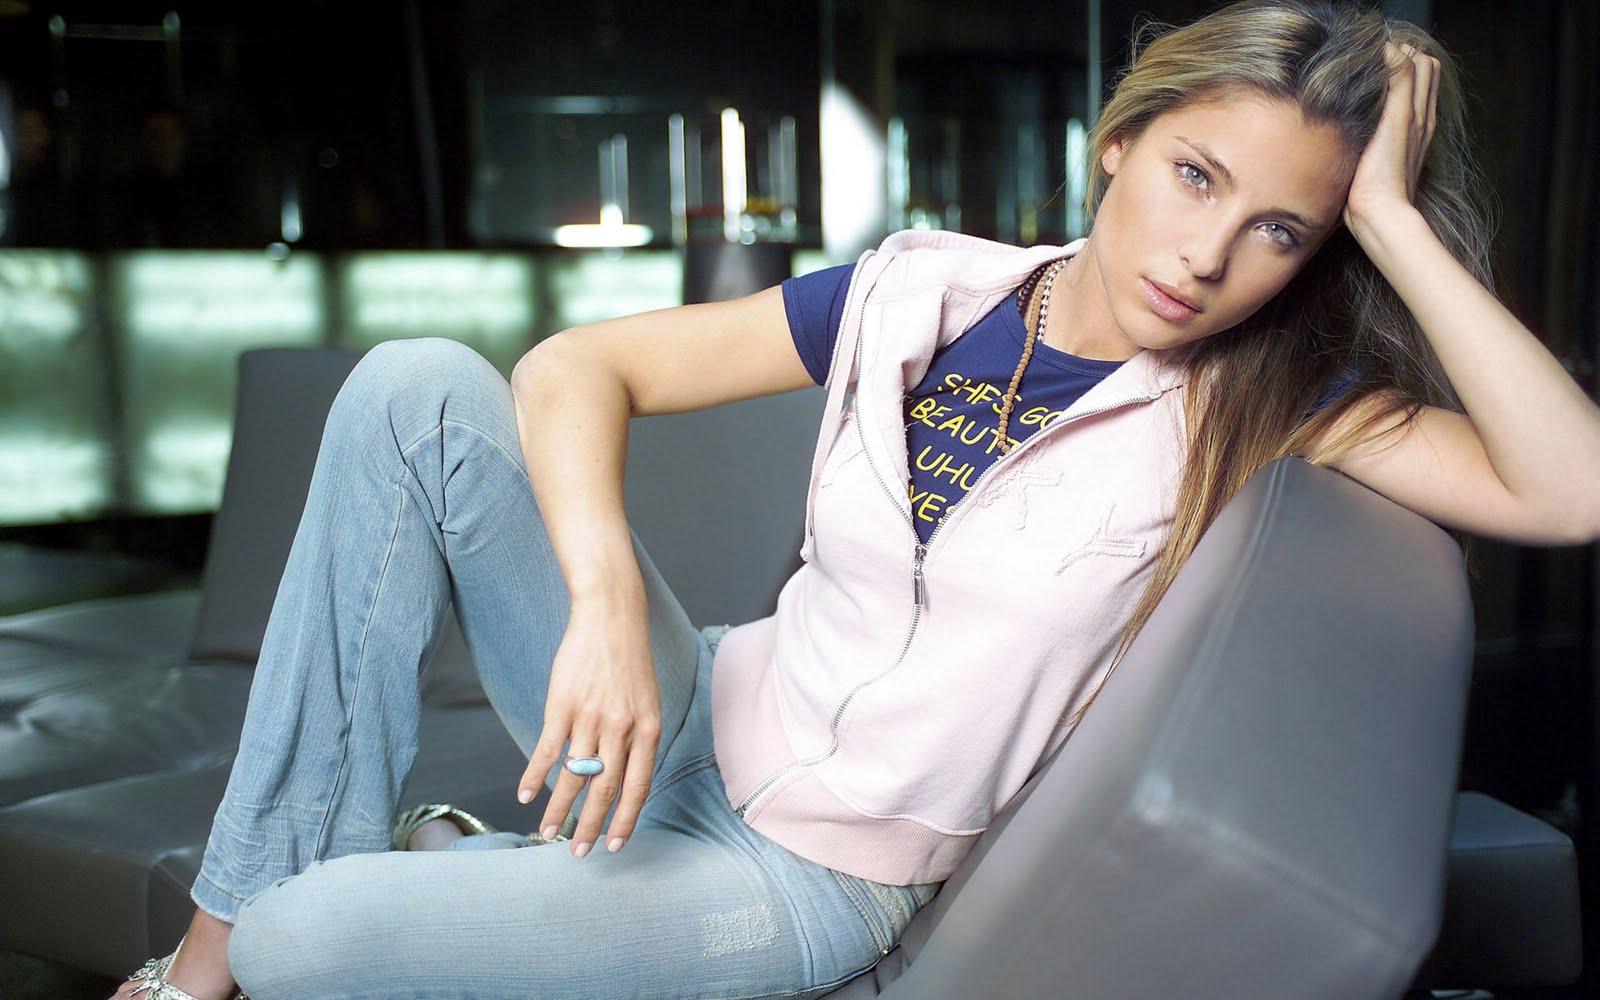 http://2.bp.blogspot.com/-EKUJYhFfCdE/TjE8qpsYC4I/AAAAAAAACys/Kxfl4FTN_Vk/s1600/Elsa_Pataky_hd_wallpapers_couch_jeans_bikini_shirt_top_look_nic_smile.jpg